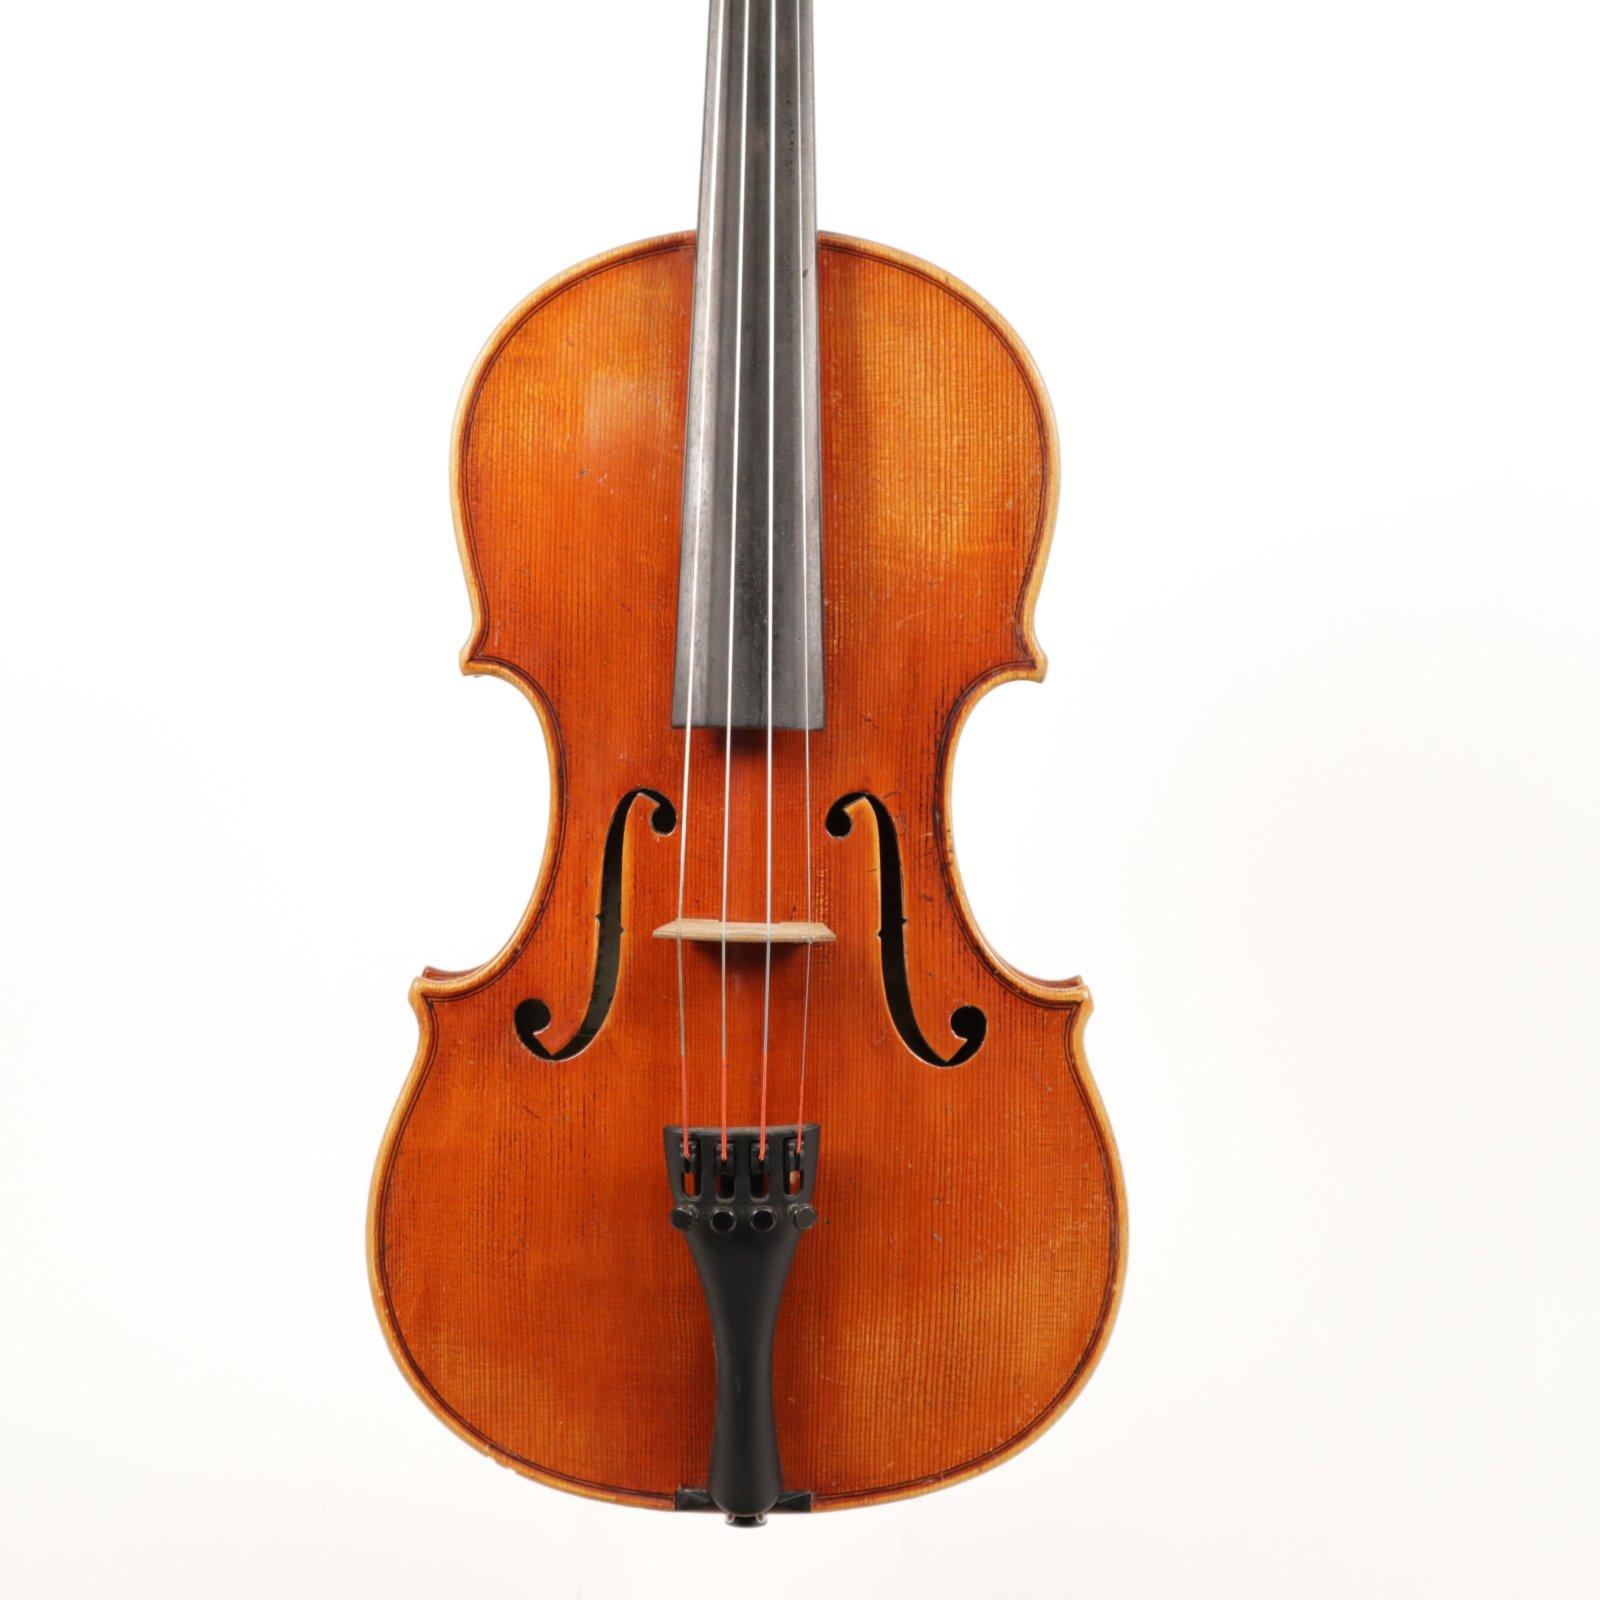 3/4 Guiseppe Amati #855 Violin